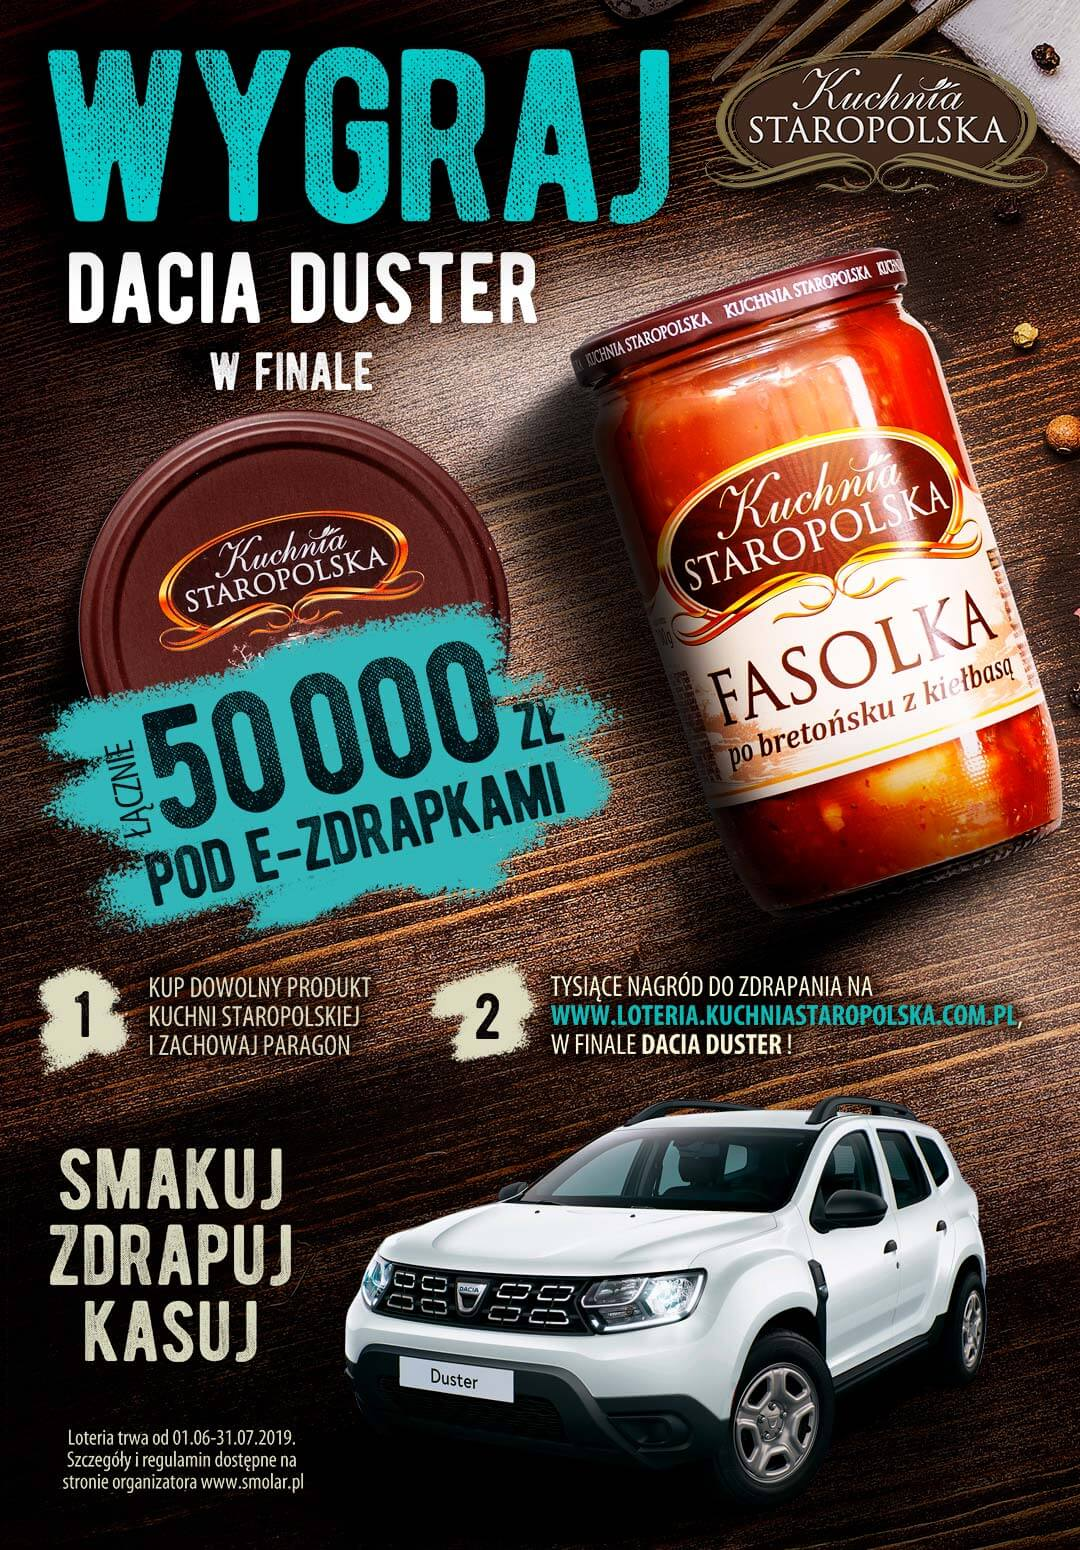 Smakuj Zdrapuj Kasuj: rusza loteria Kuchni Staropolskiej